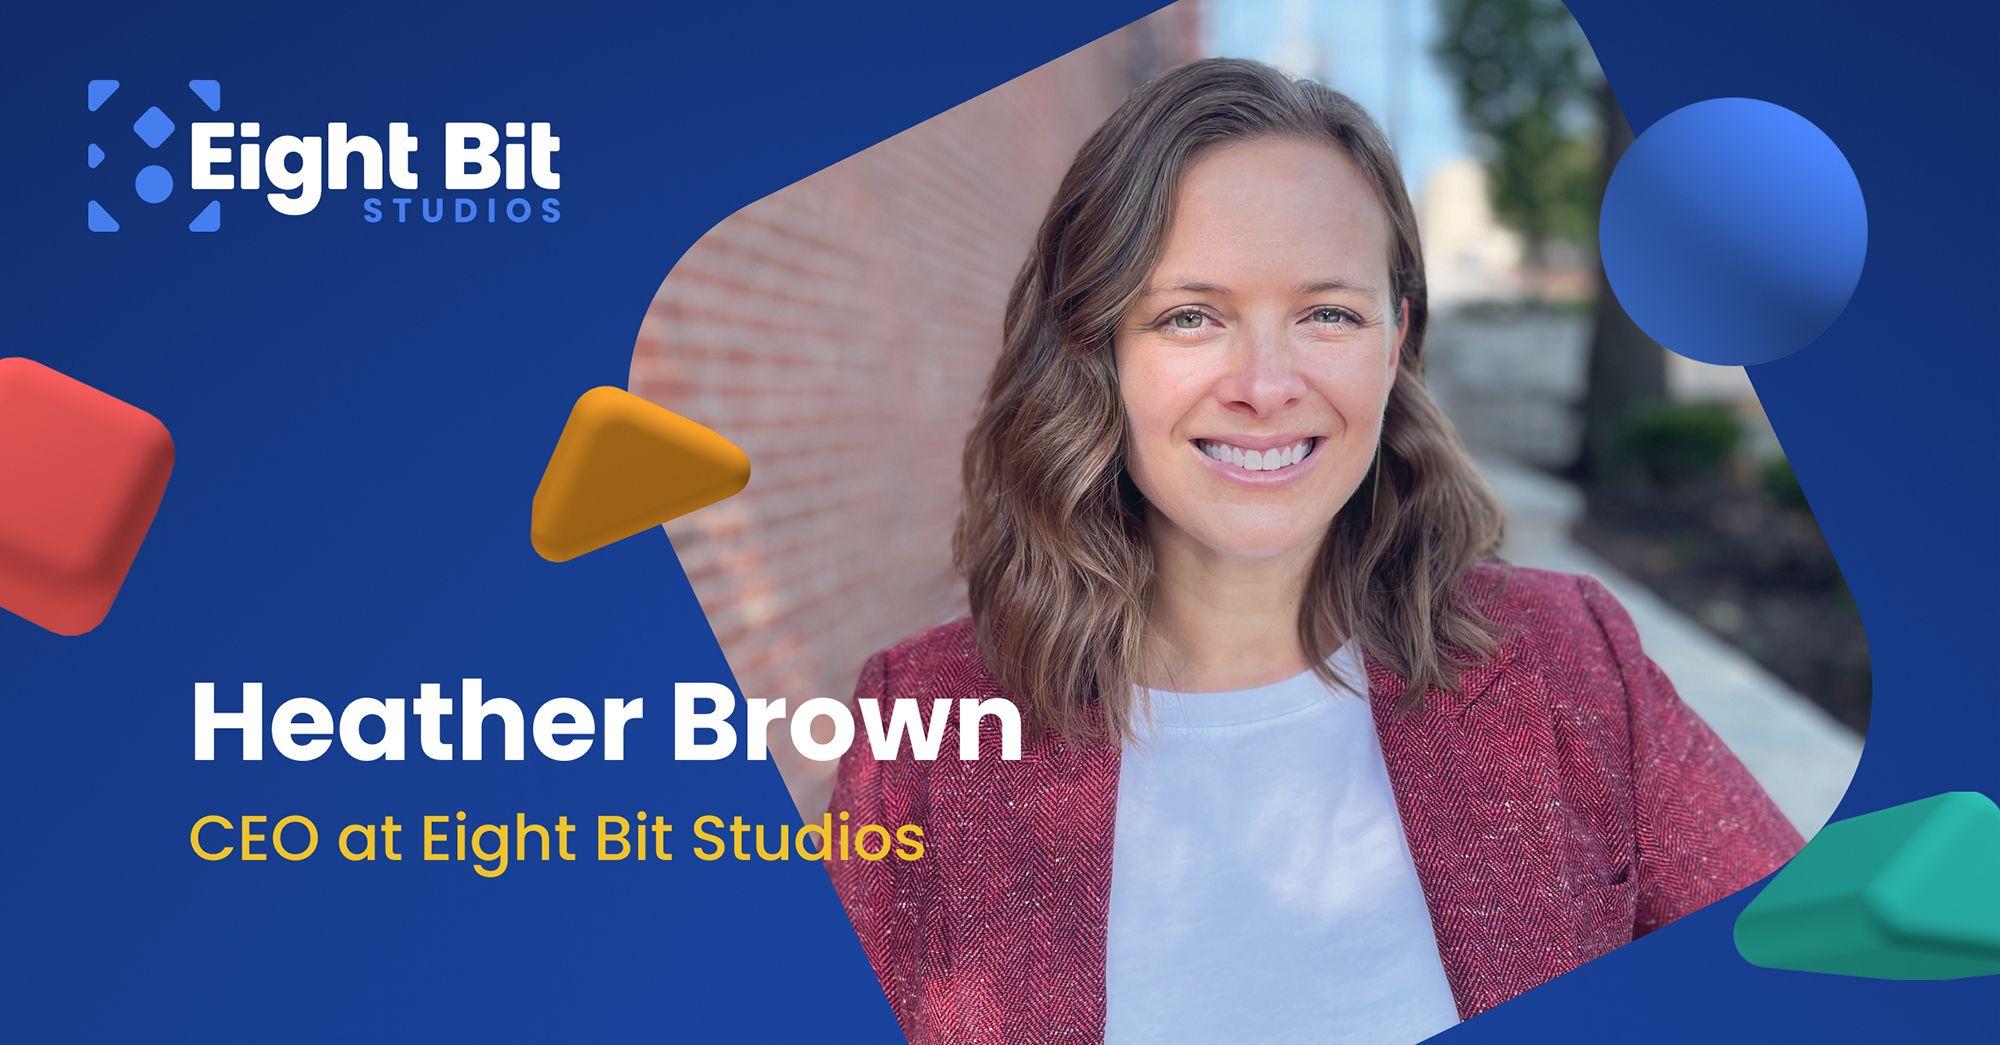 Heather Brown, CEO at Eight Bit Studios